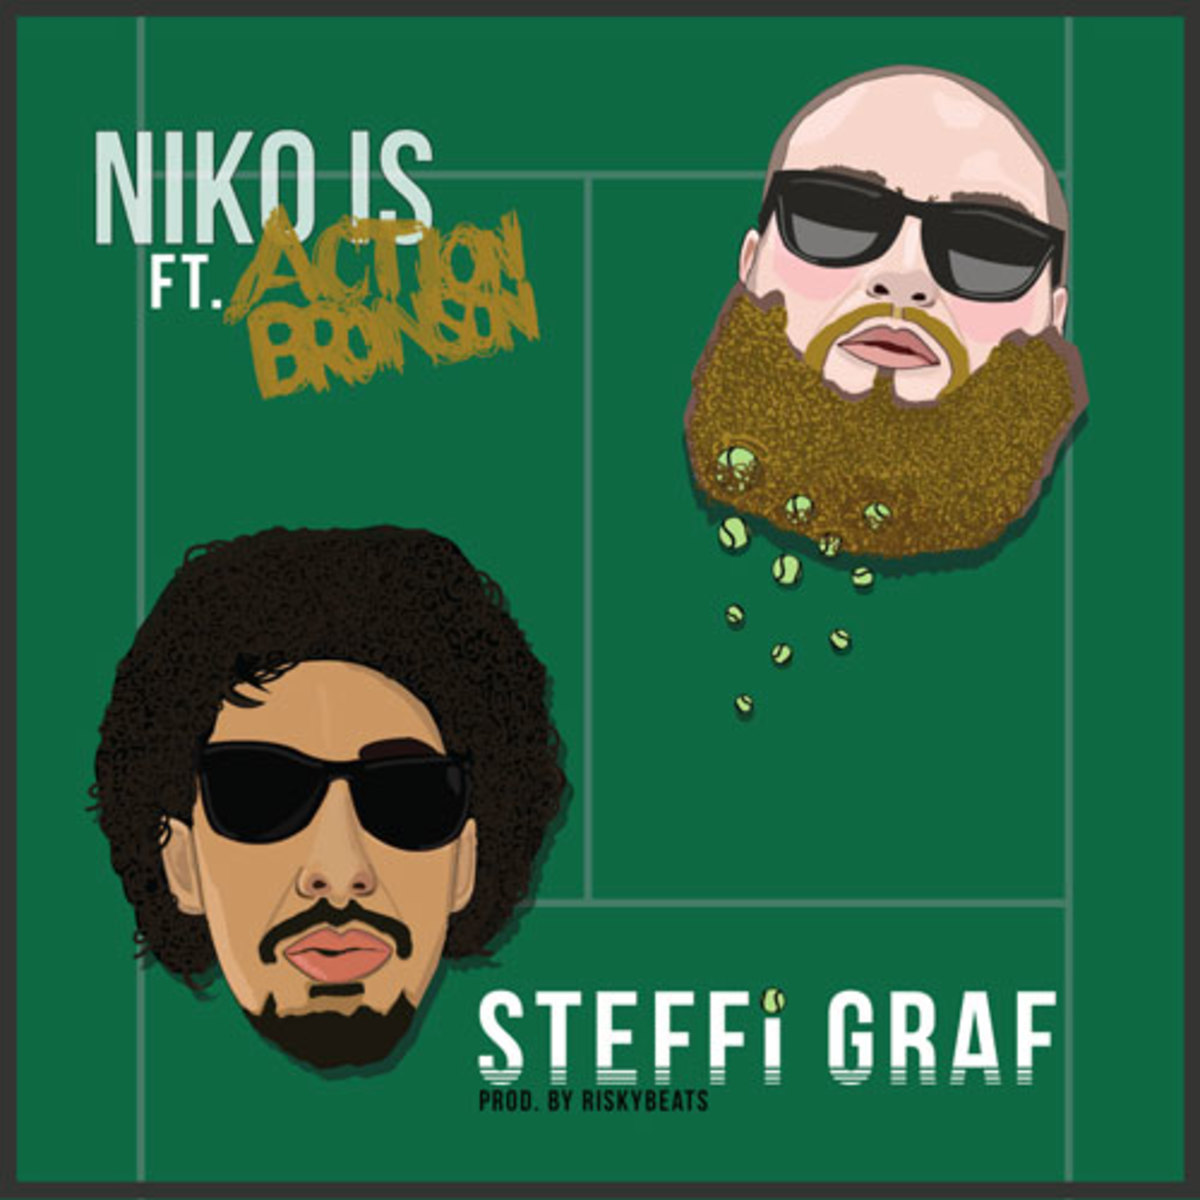 nikois-steffigraf.jpg